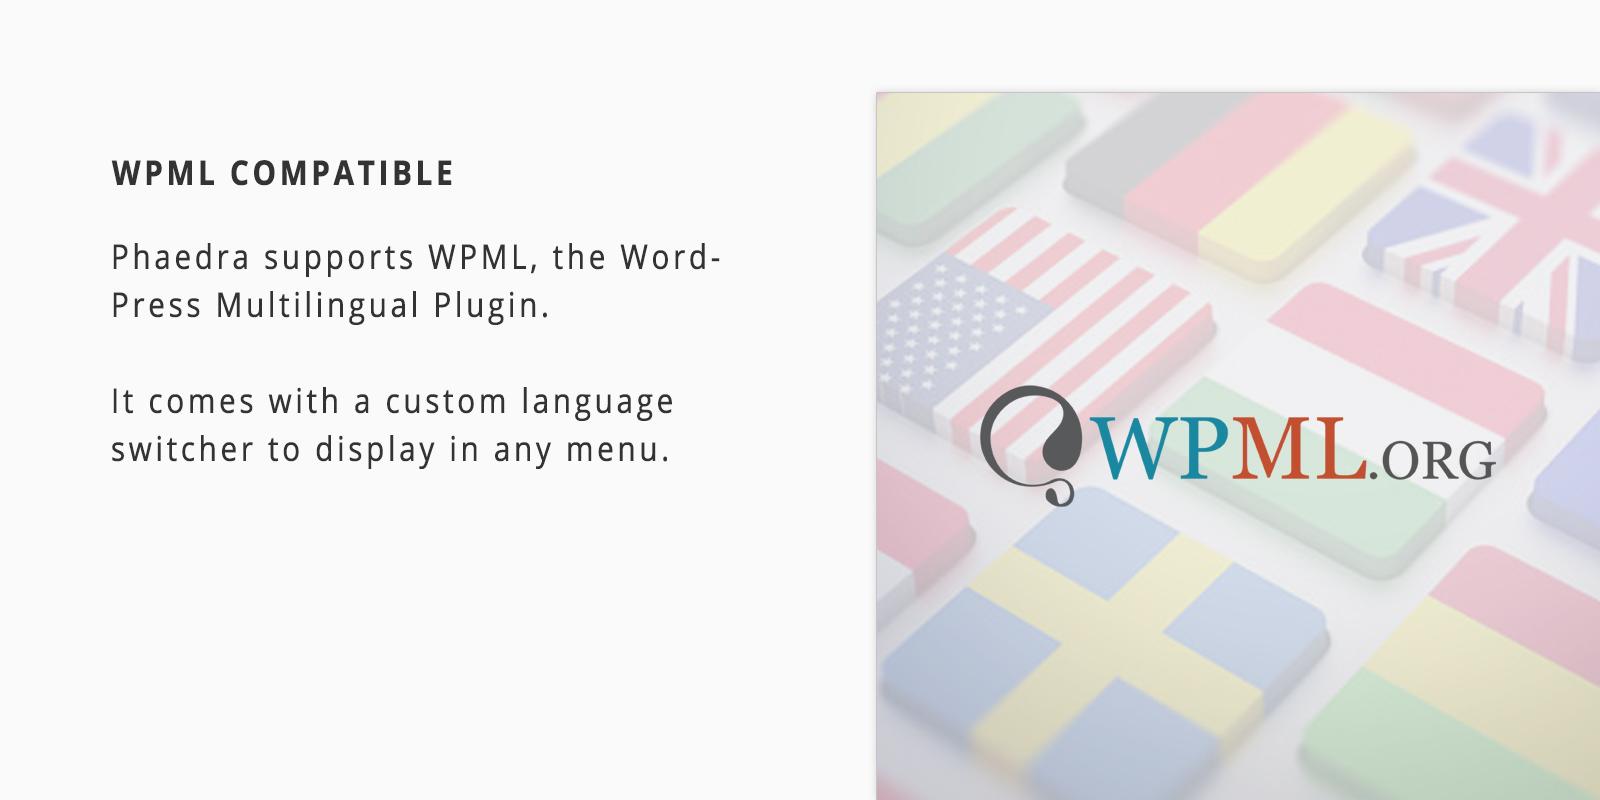 WPML Supports